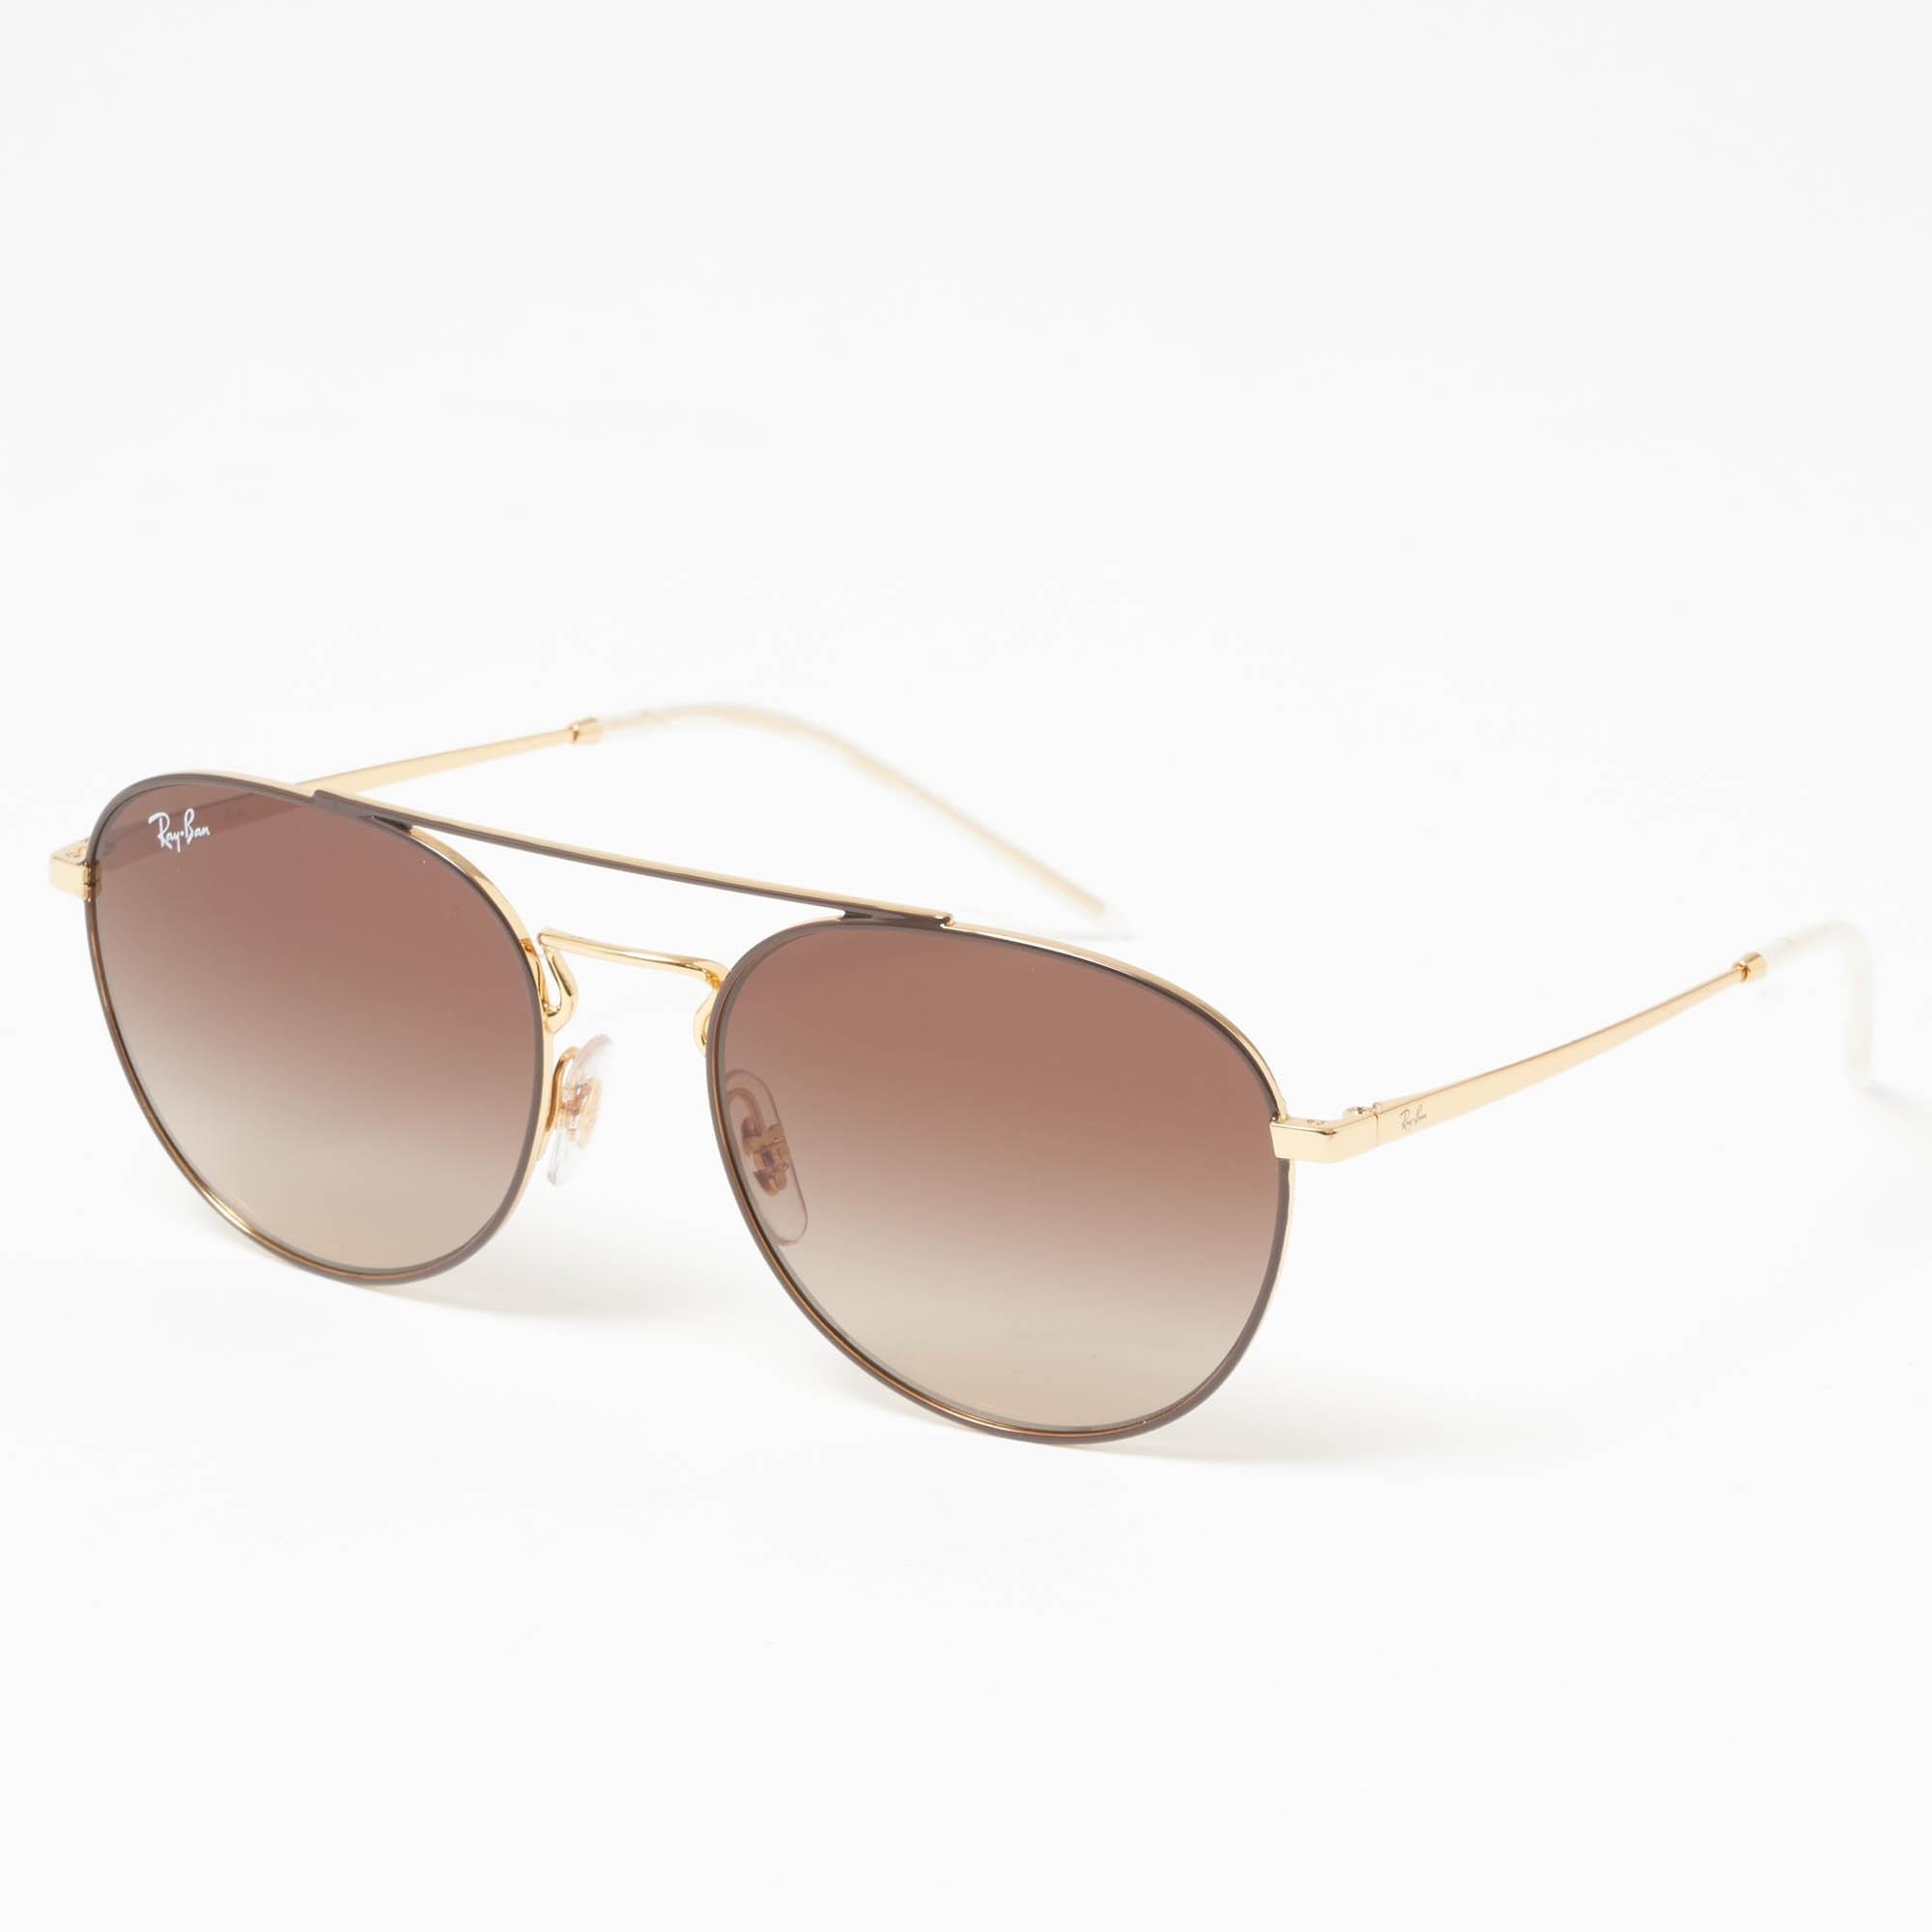 ec9901a3868 Gold RB3589 Sunglasses - Brown Gradient Lenses